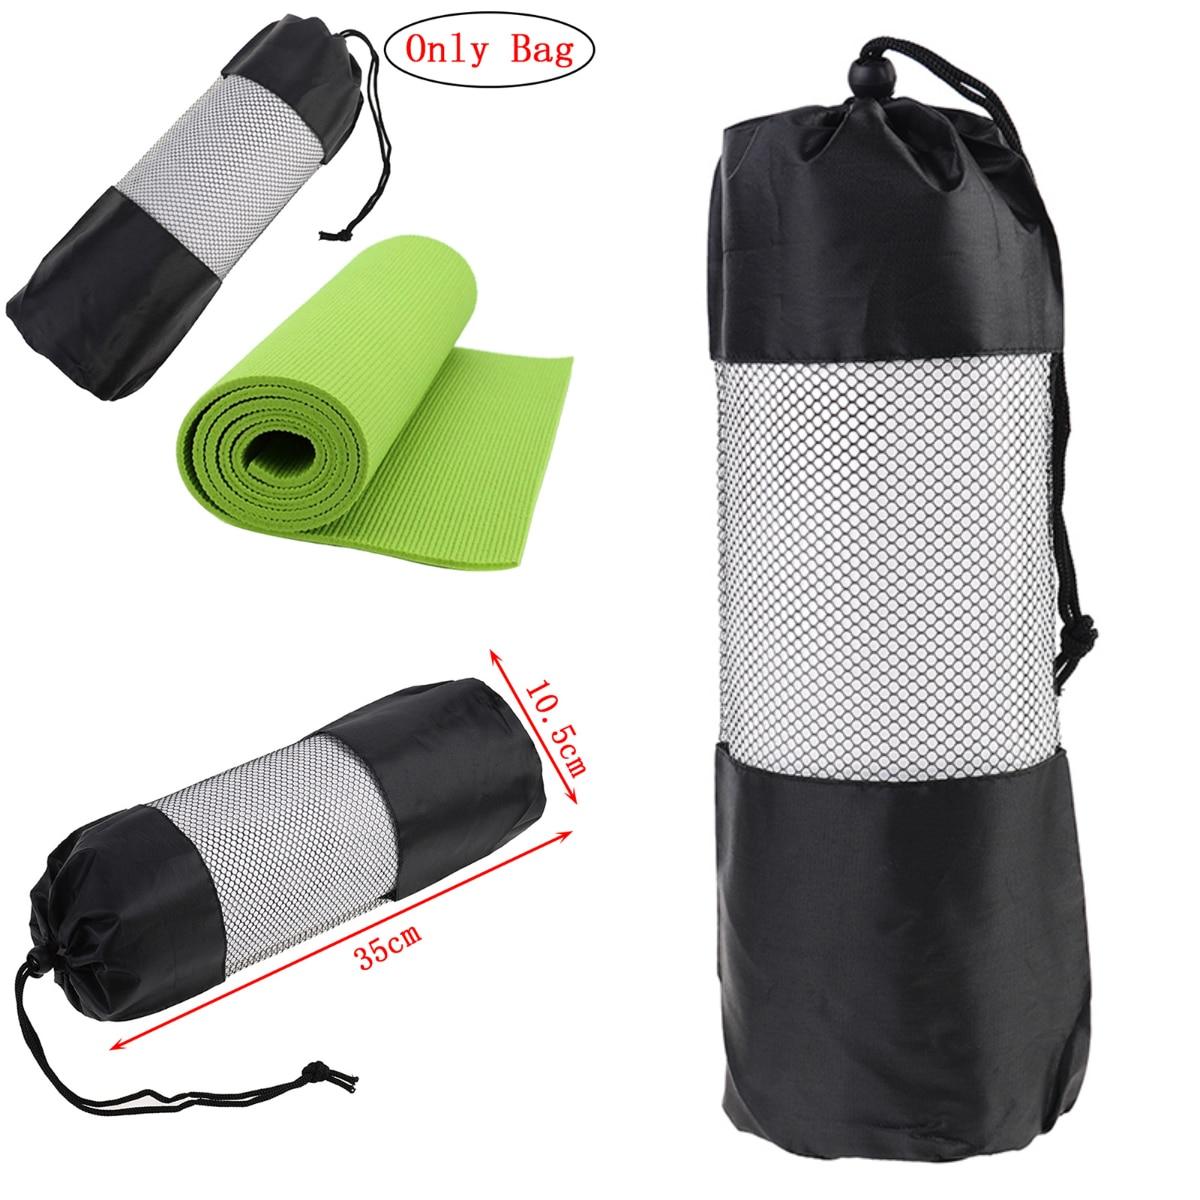 Ropa De Hombre 35*10.5cm Yoga Bag Canvas Practical Yoga Pilates Sport Exercise Mat Carry Strap Drawstring Bag Gym Bag Fitness Backpack